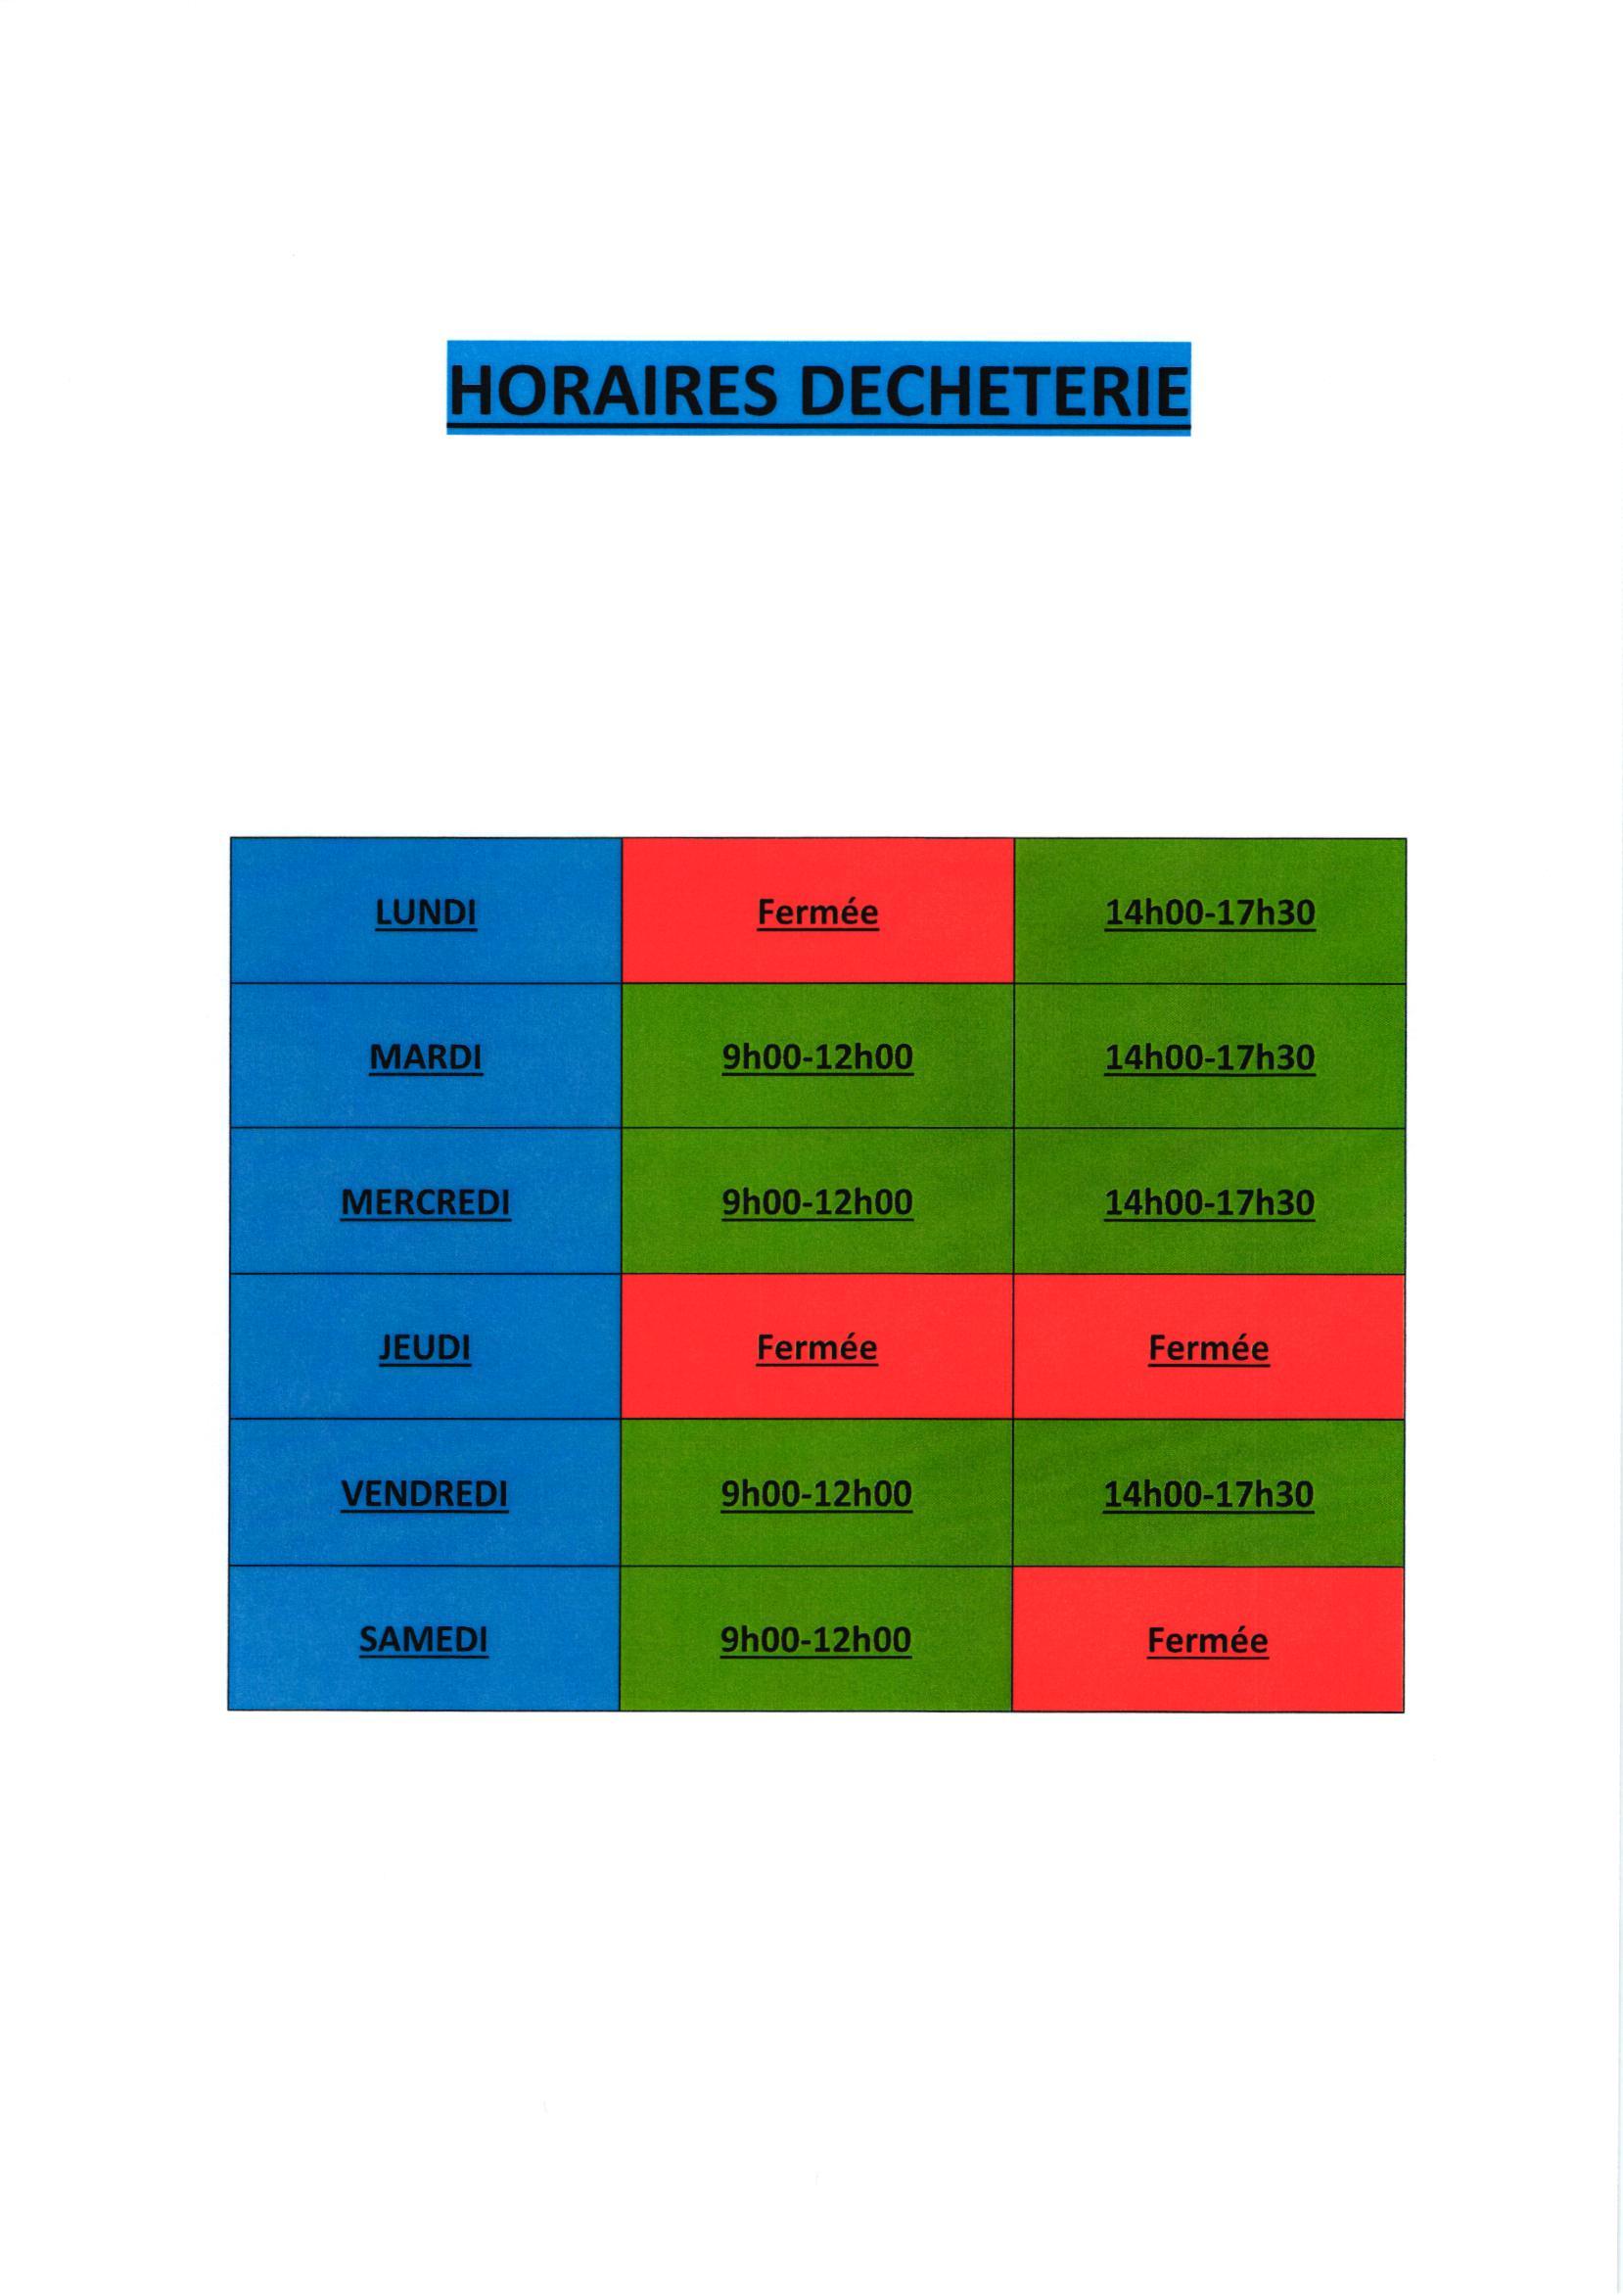 HORAIRES DECHETERIE.jpg